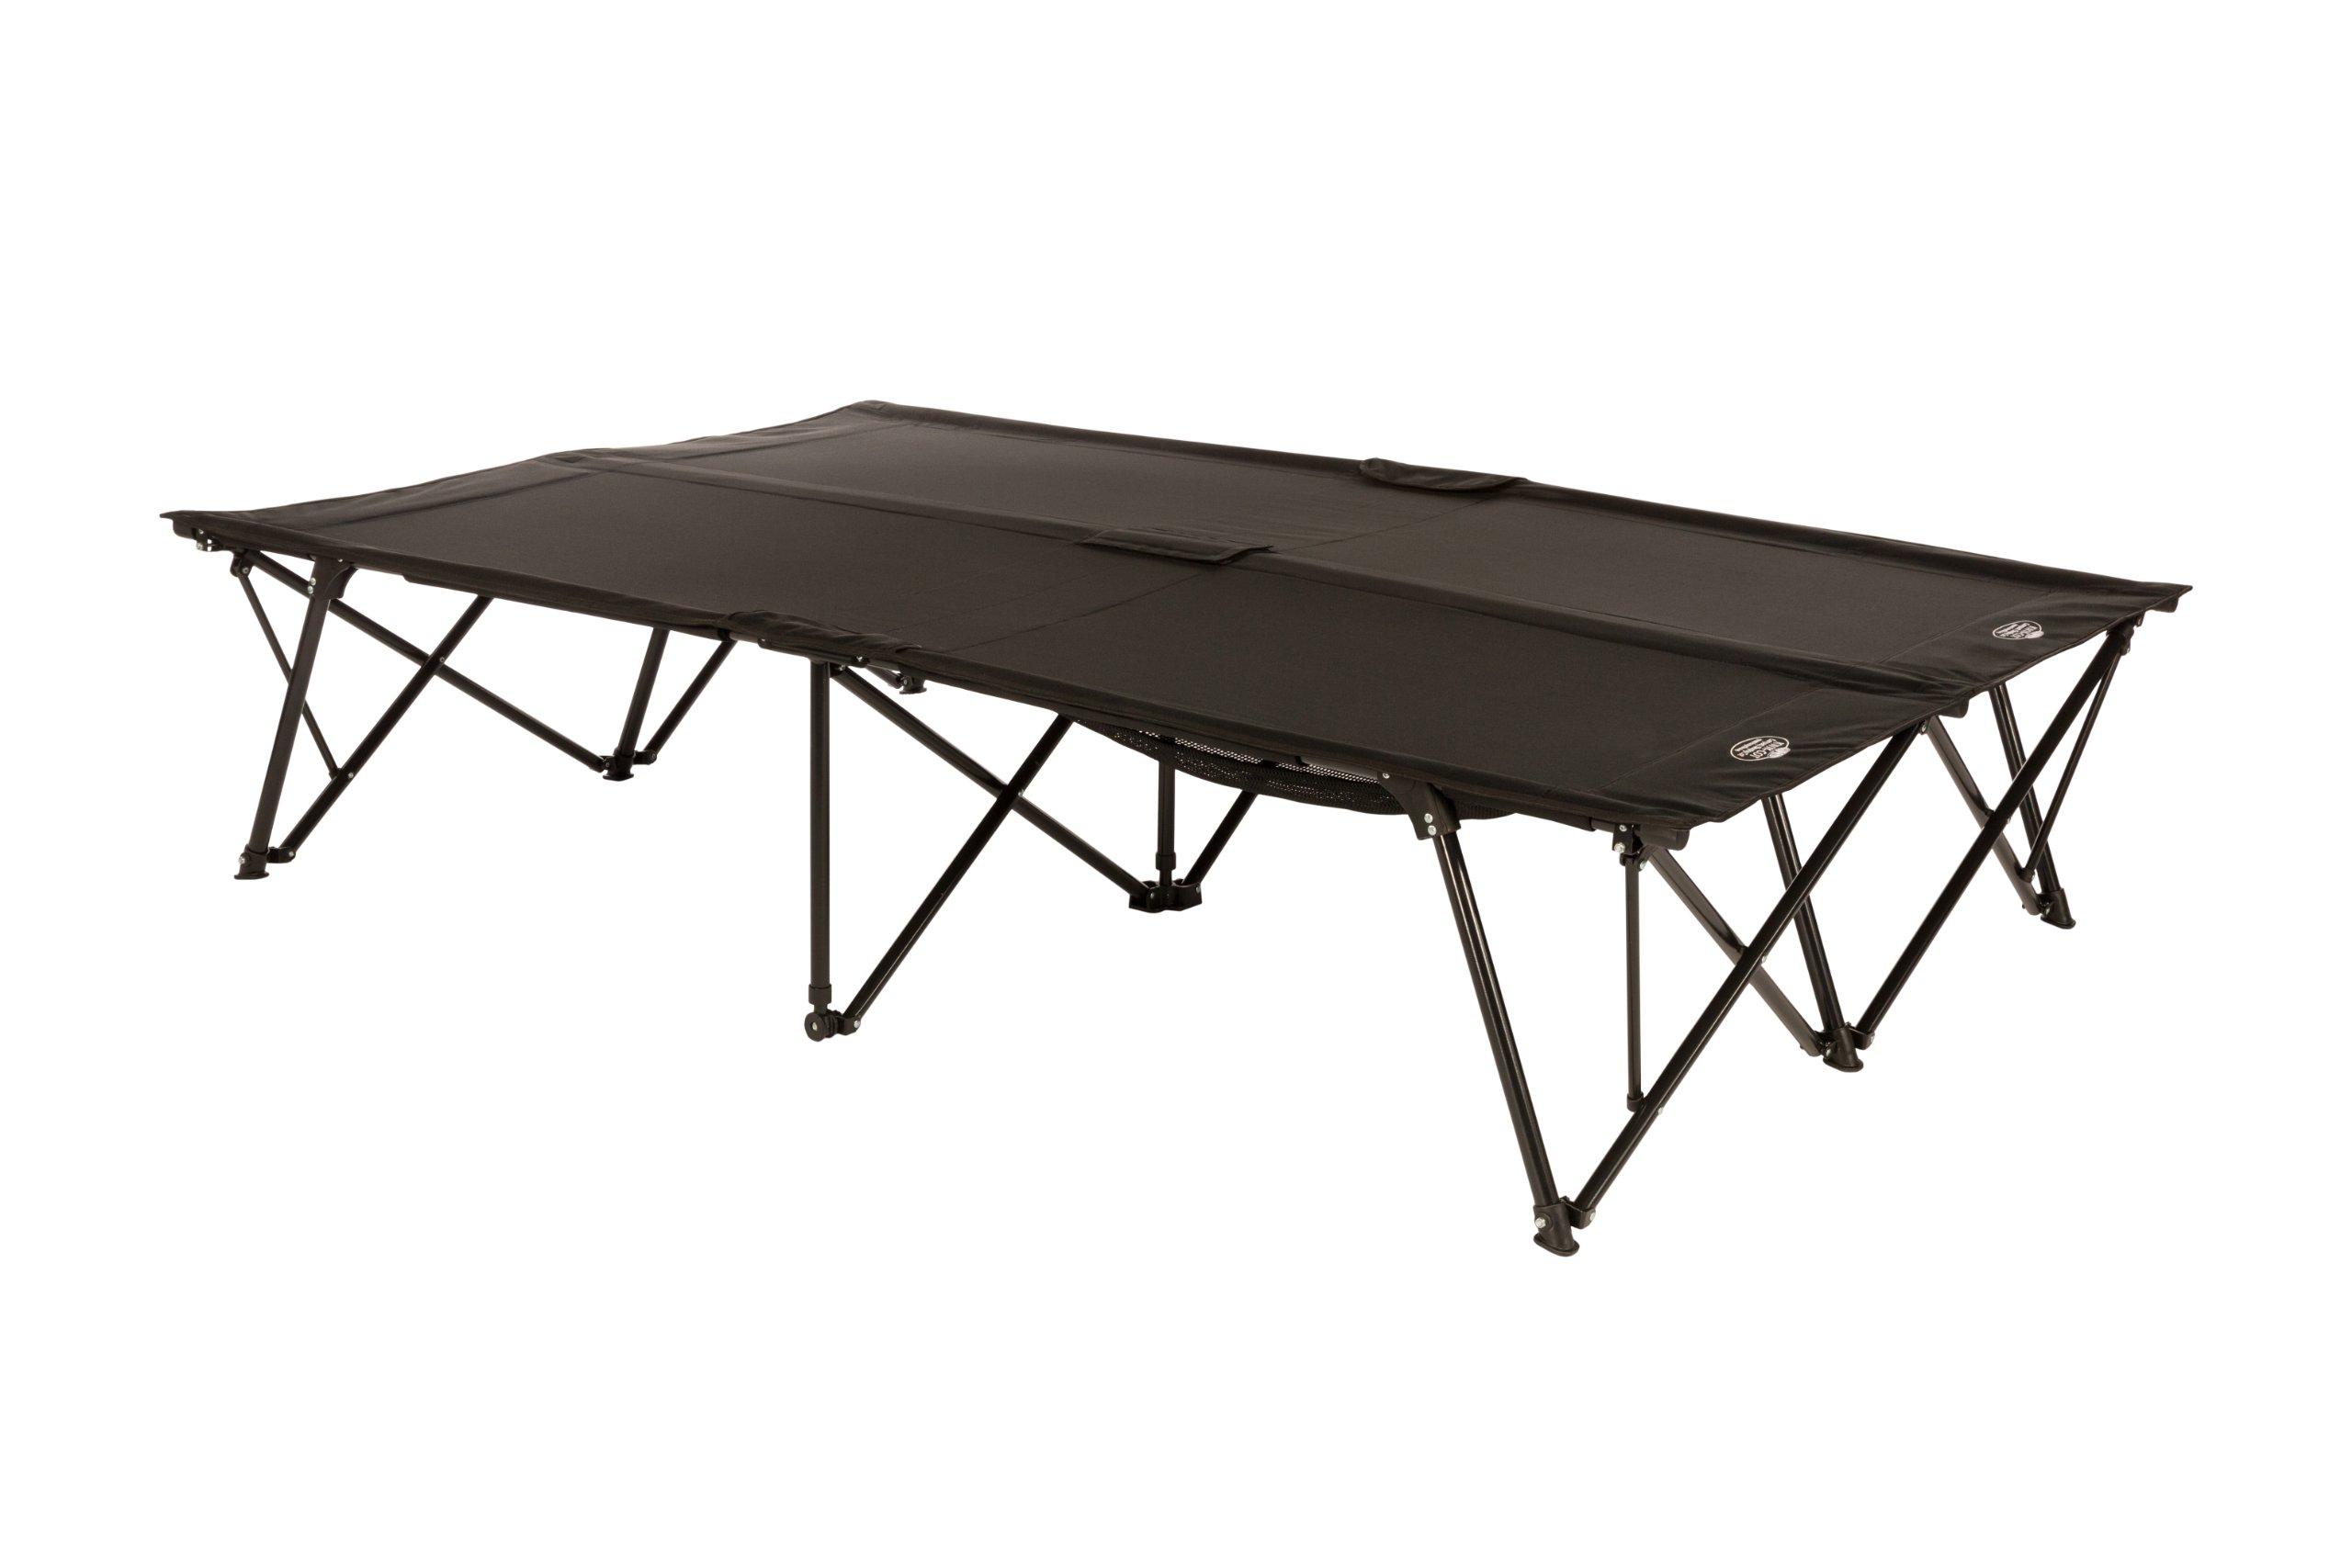 Kamp-Rite 3897864 Tent Cot Double Kwik-Cot FC321